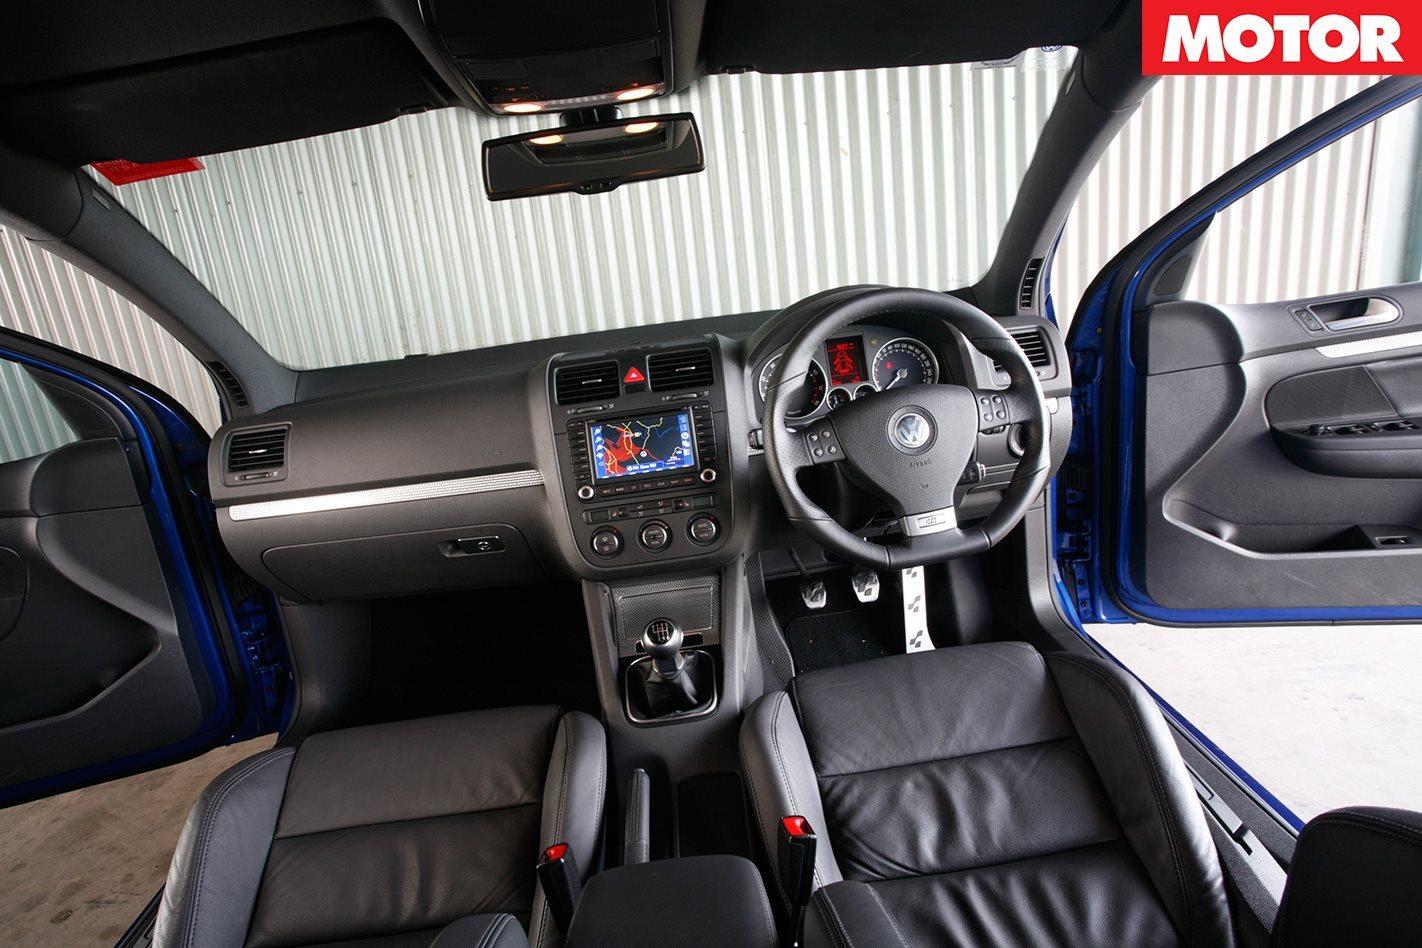 2008 Golf R32 interior